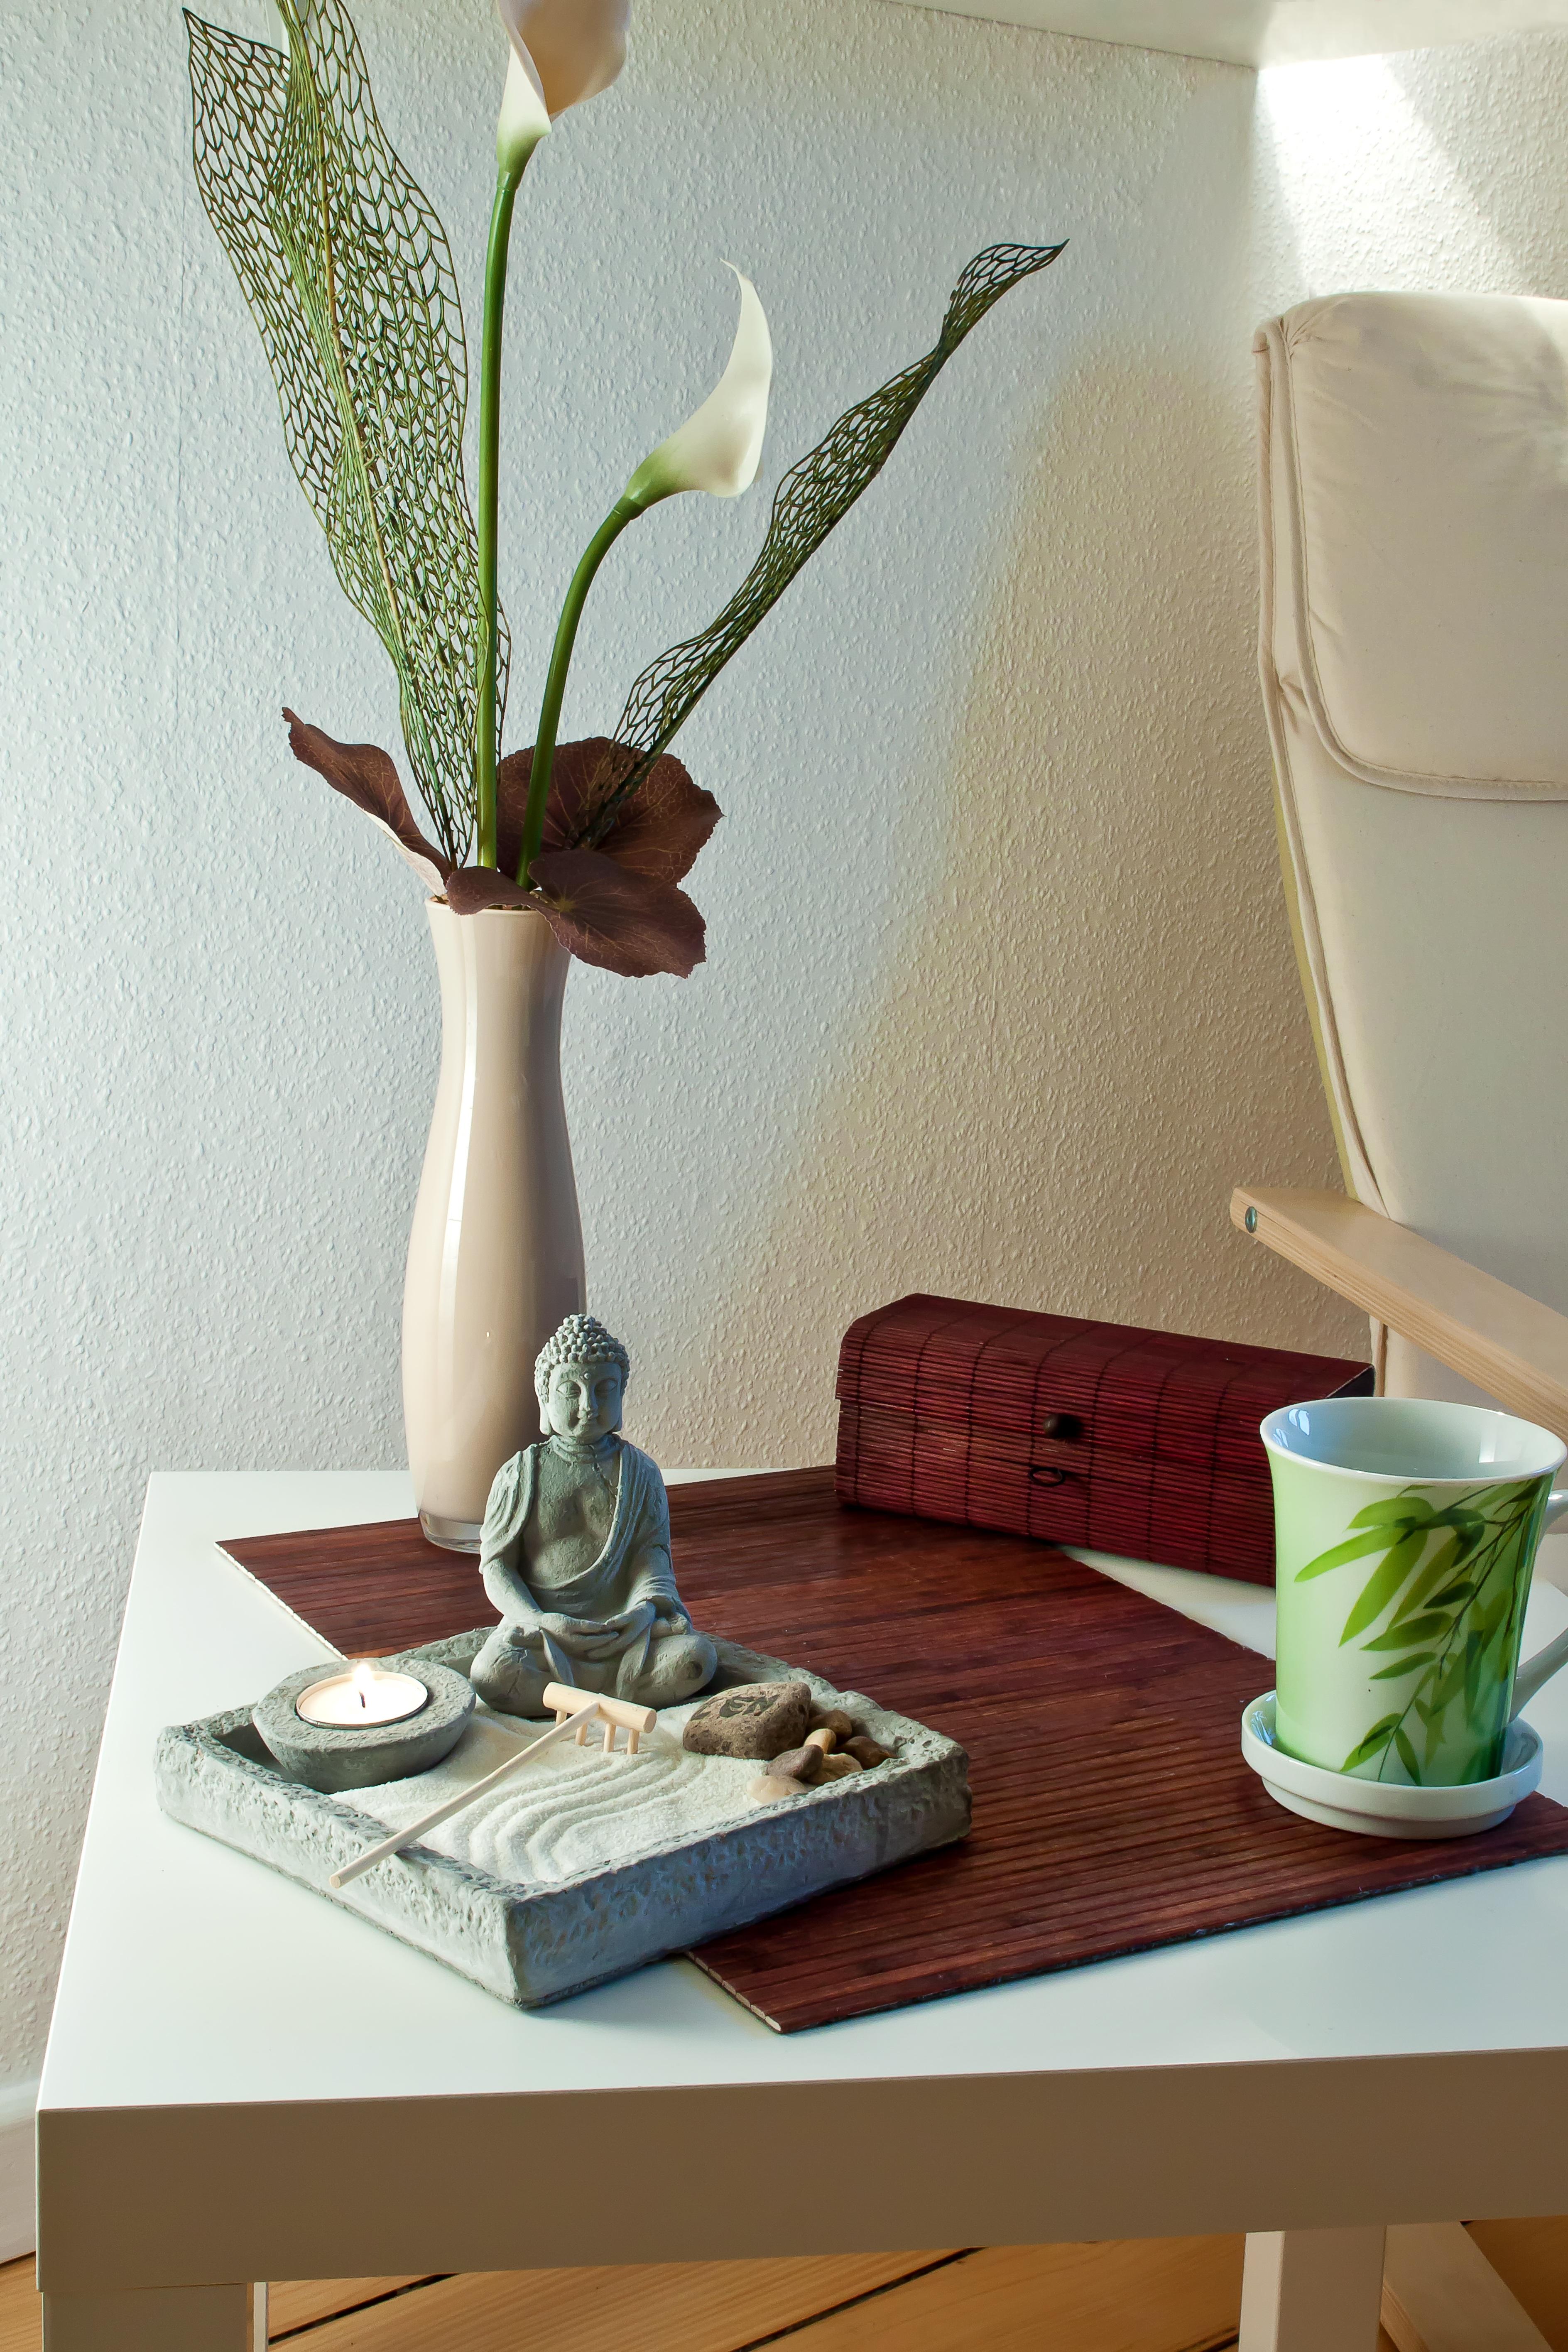 free images table wood flower smoke statue meditate. Black Bedroom Furniture Sets. Home Design Ideas